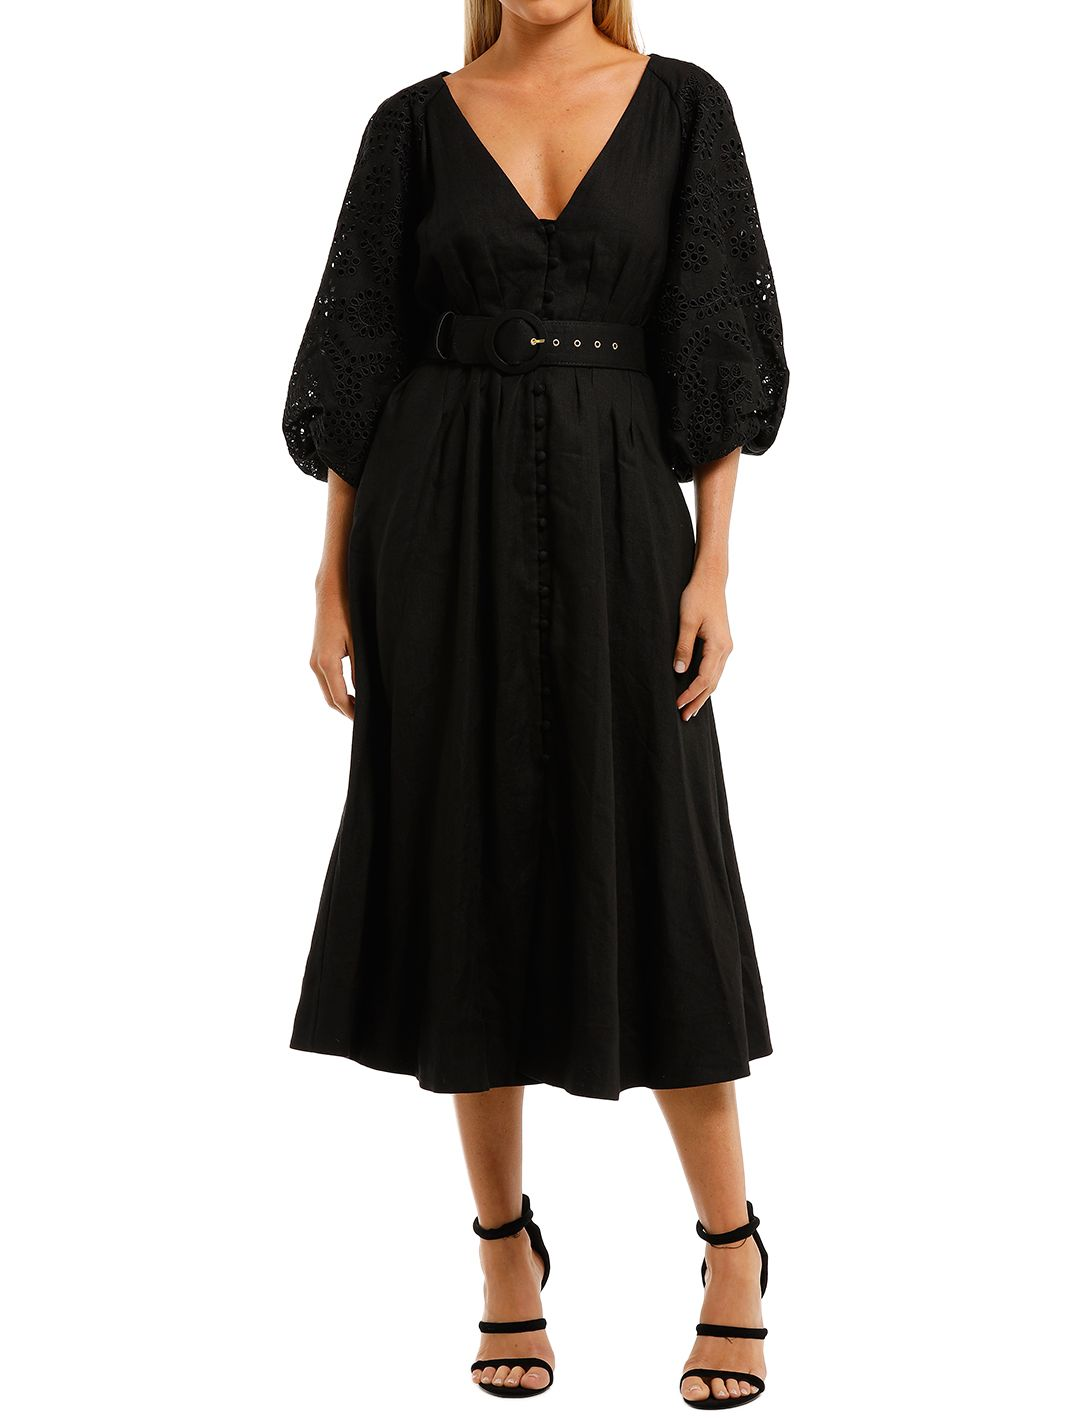 Nicholas-Hasina-Dress-Black-Front